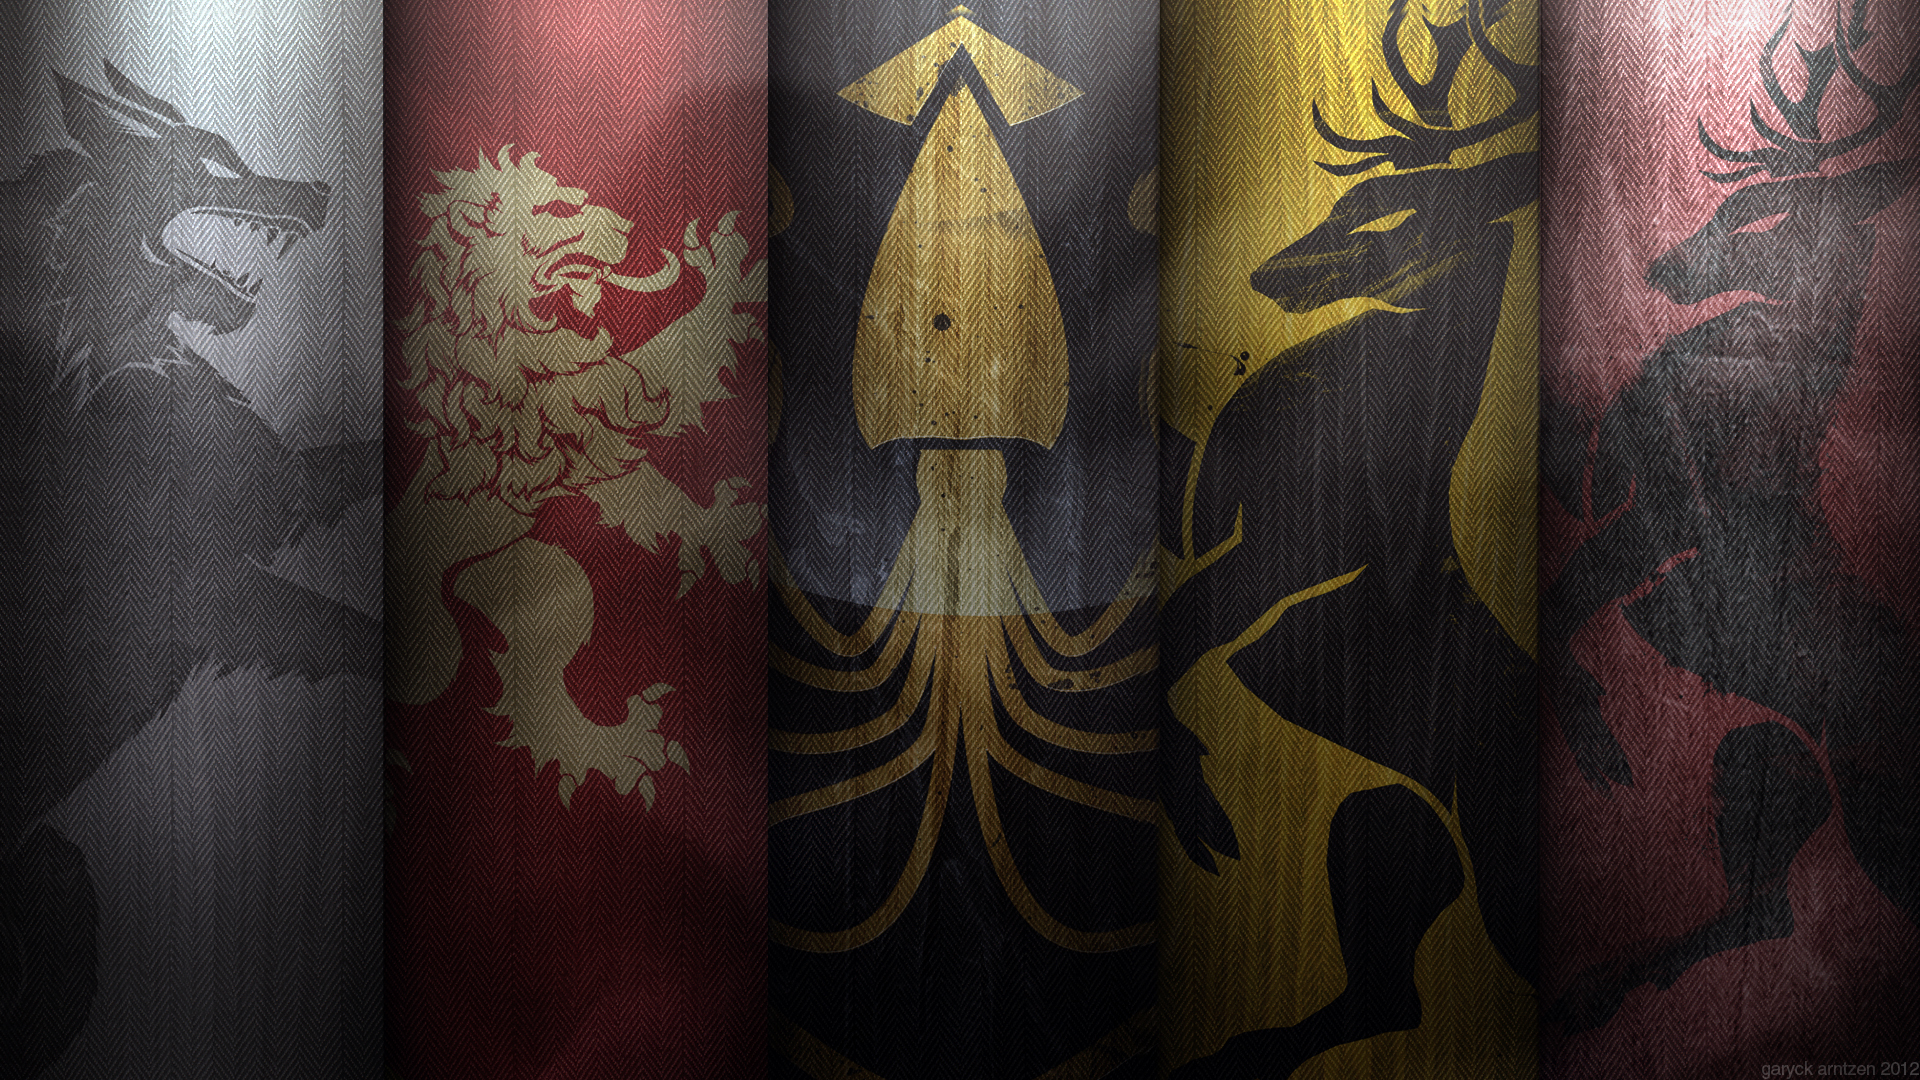 Download Game of Thrones Wallpapers HD   Celtas Today 1920x1080